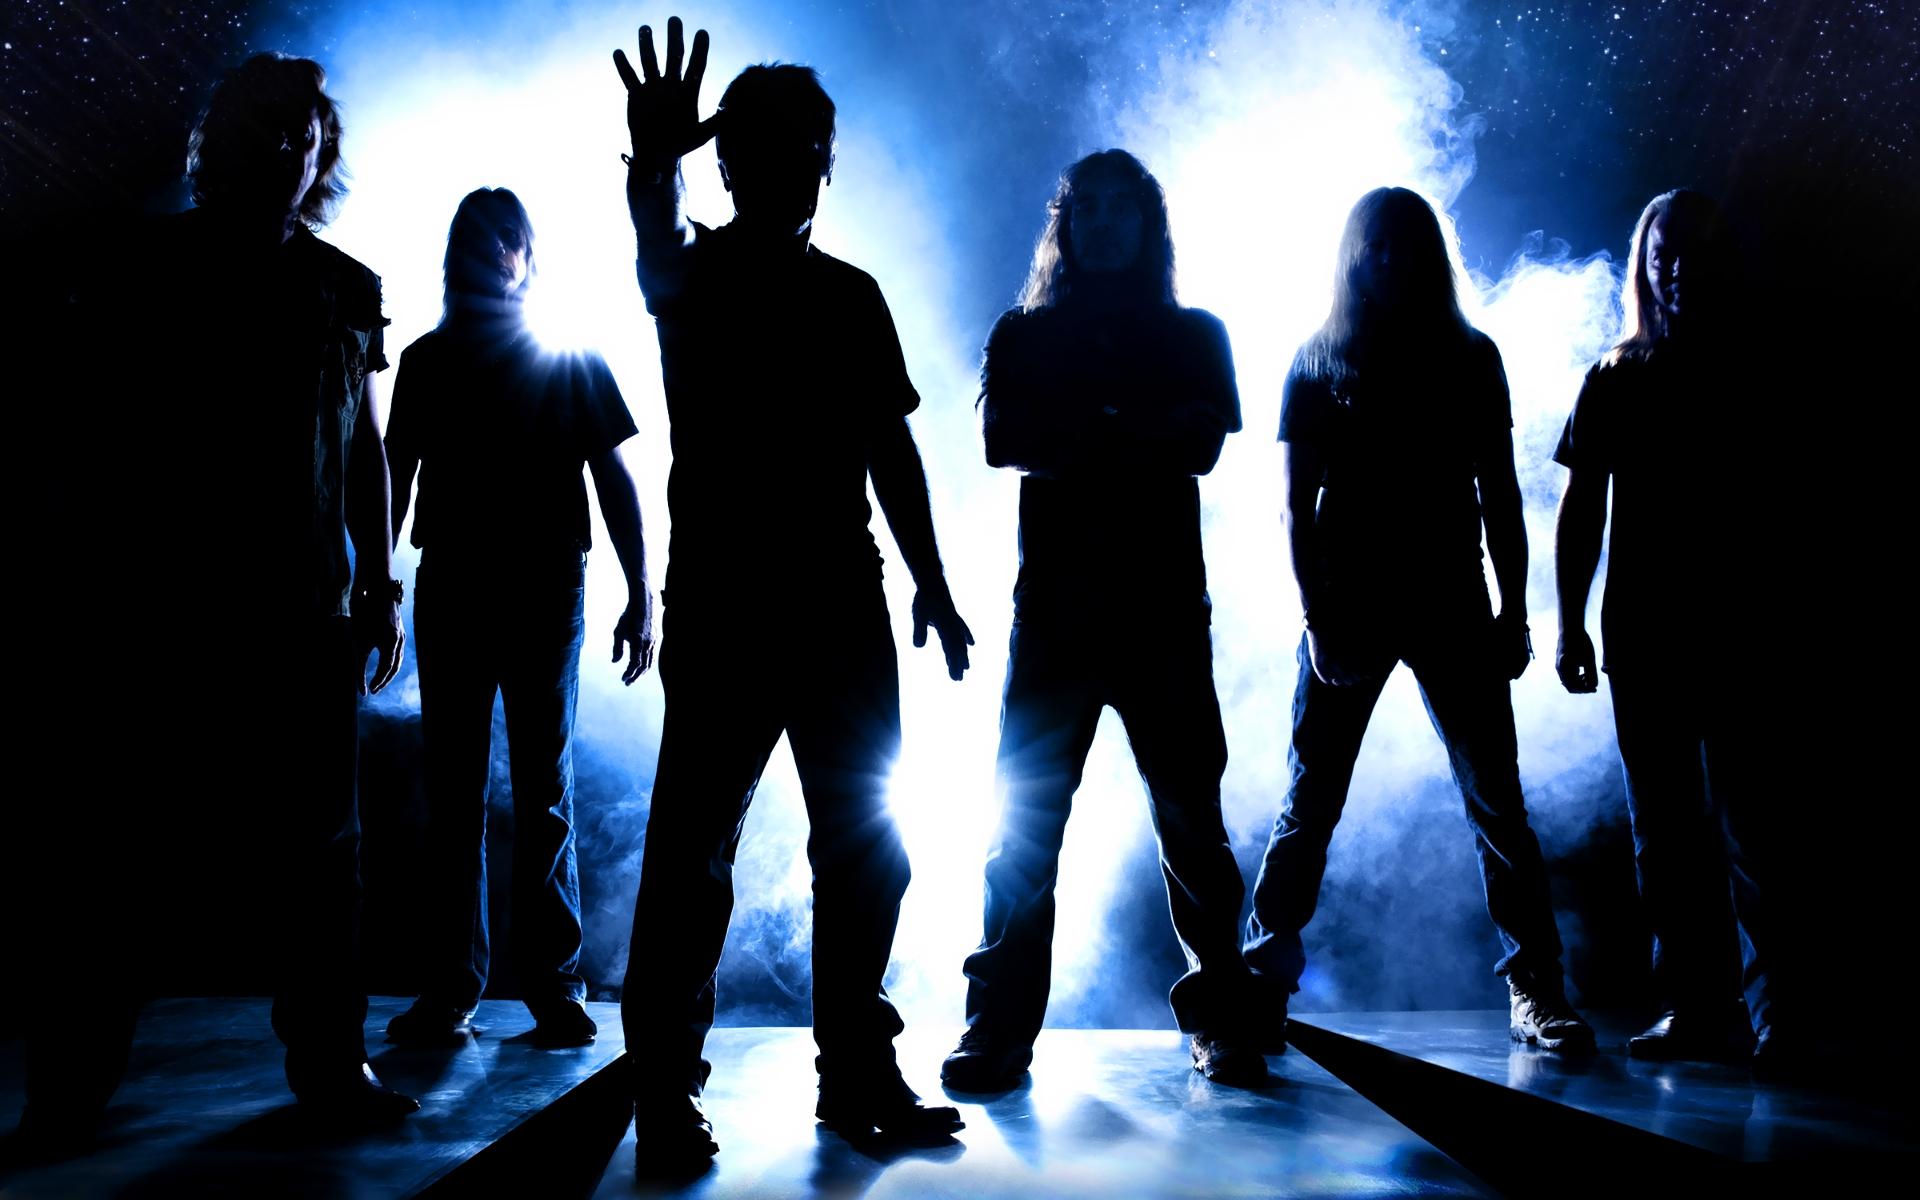 Wallpaper : night, shadow, silhouette, band, Iron Maiden ... - photo#33